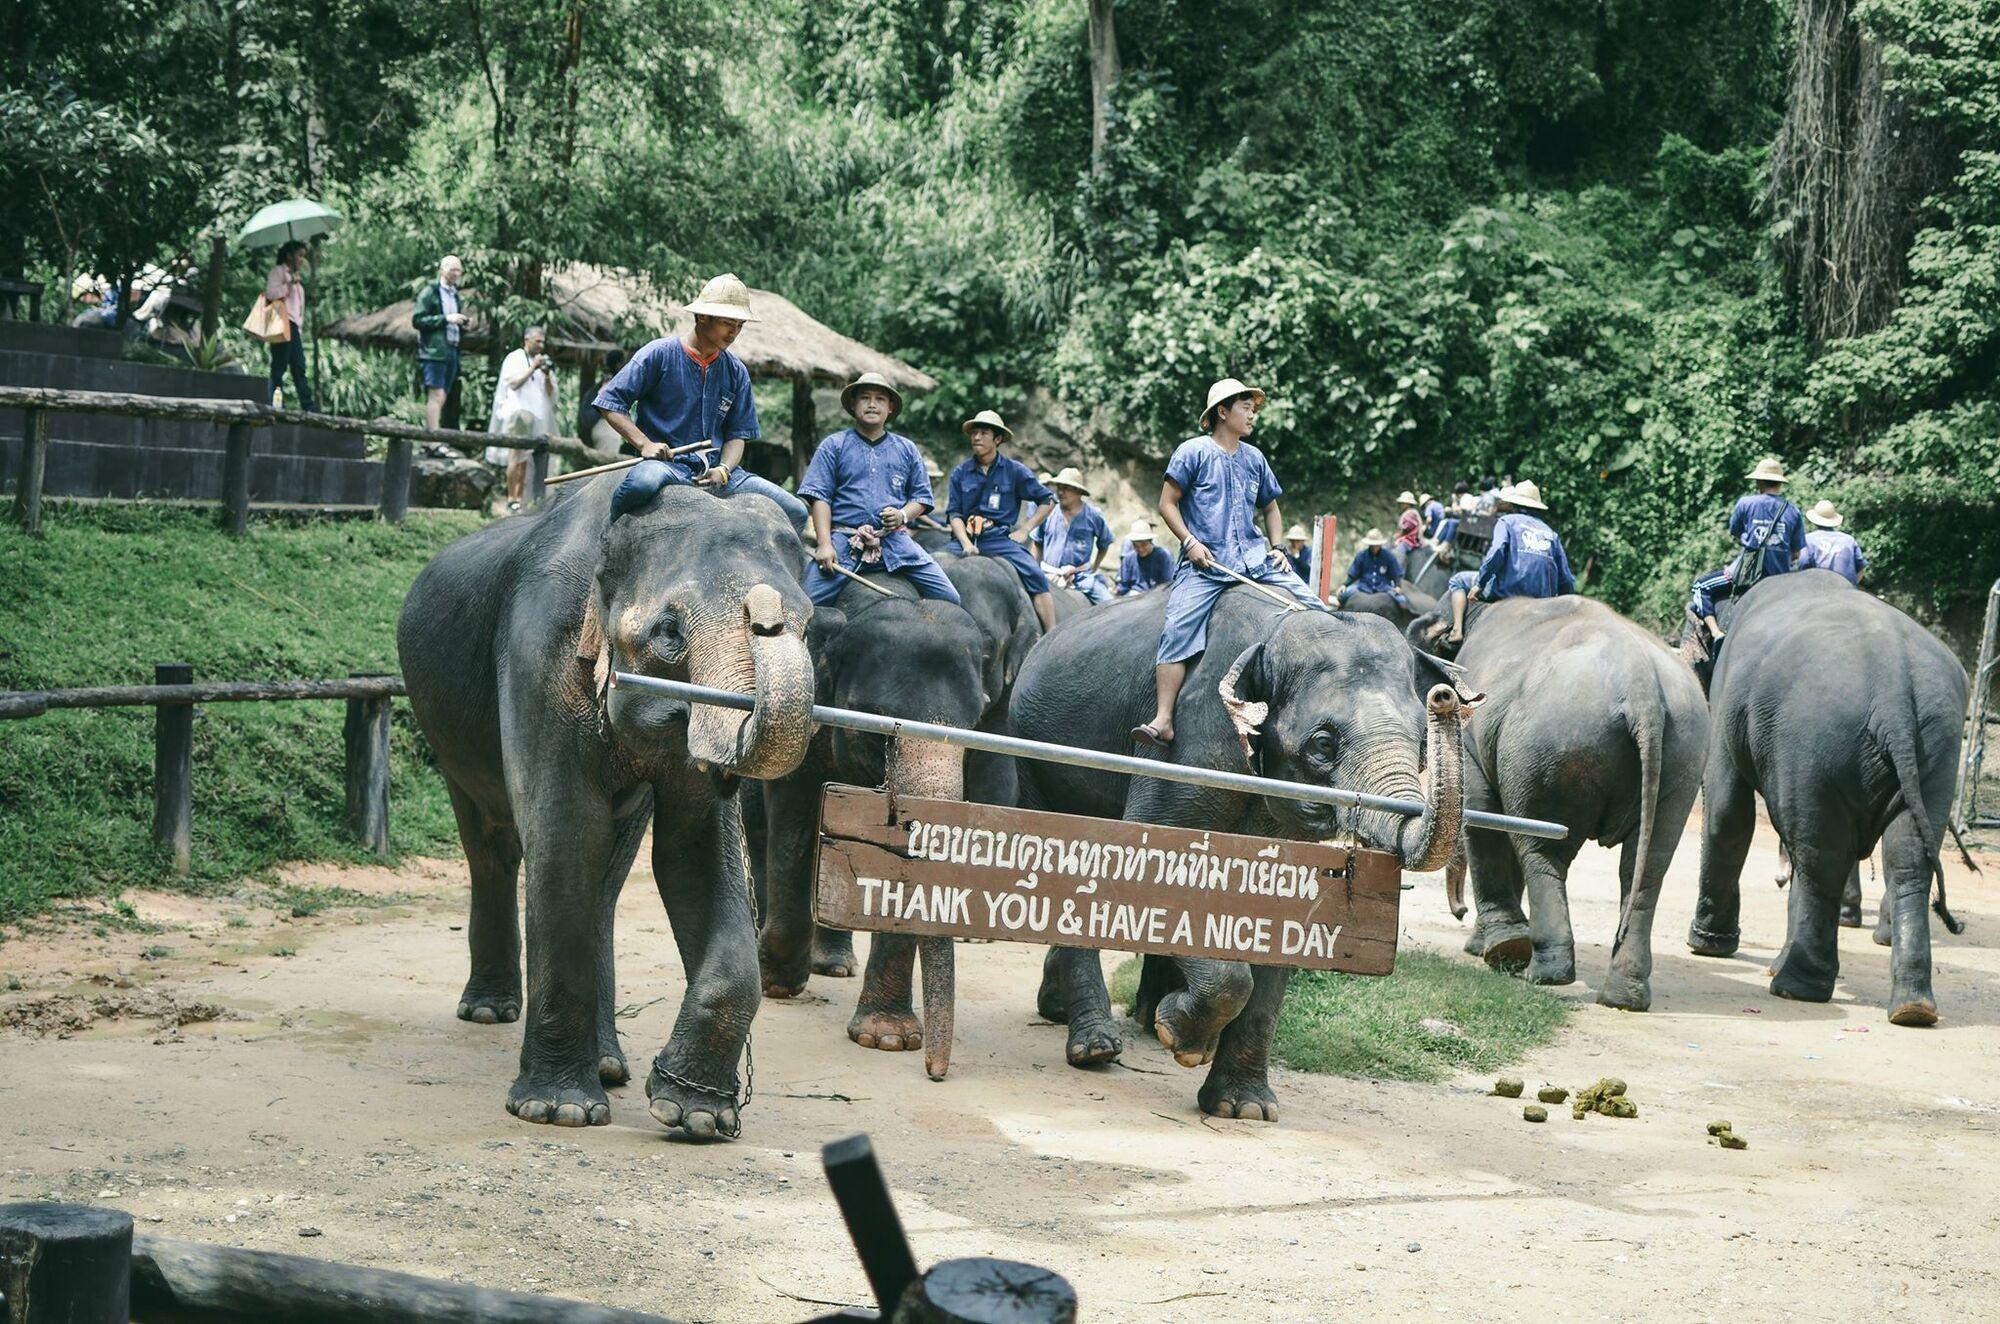 """Люди зникали пачками"": про темну сторону райського Таїланду"